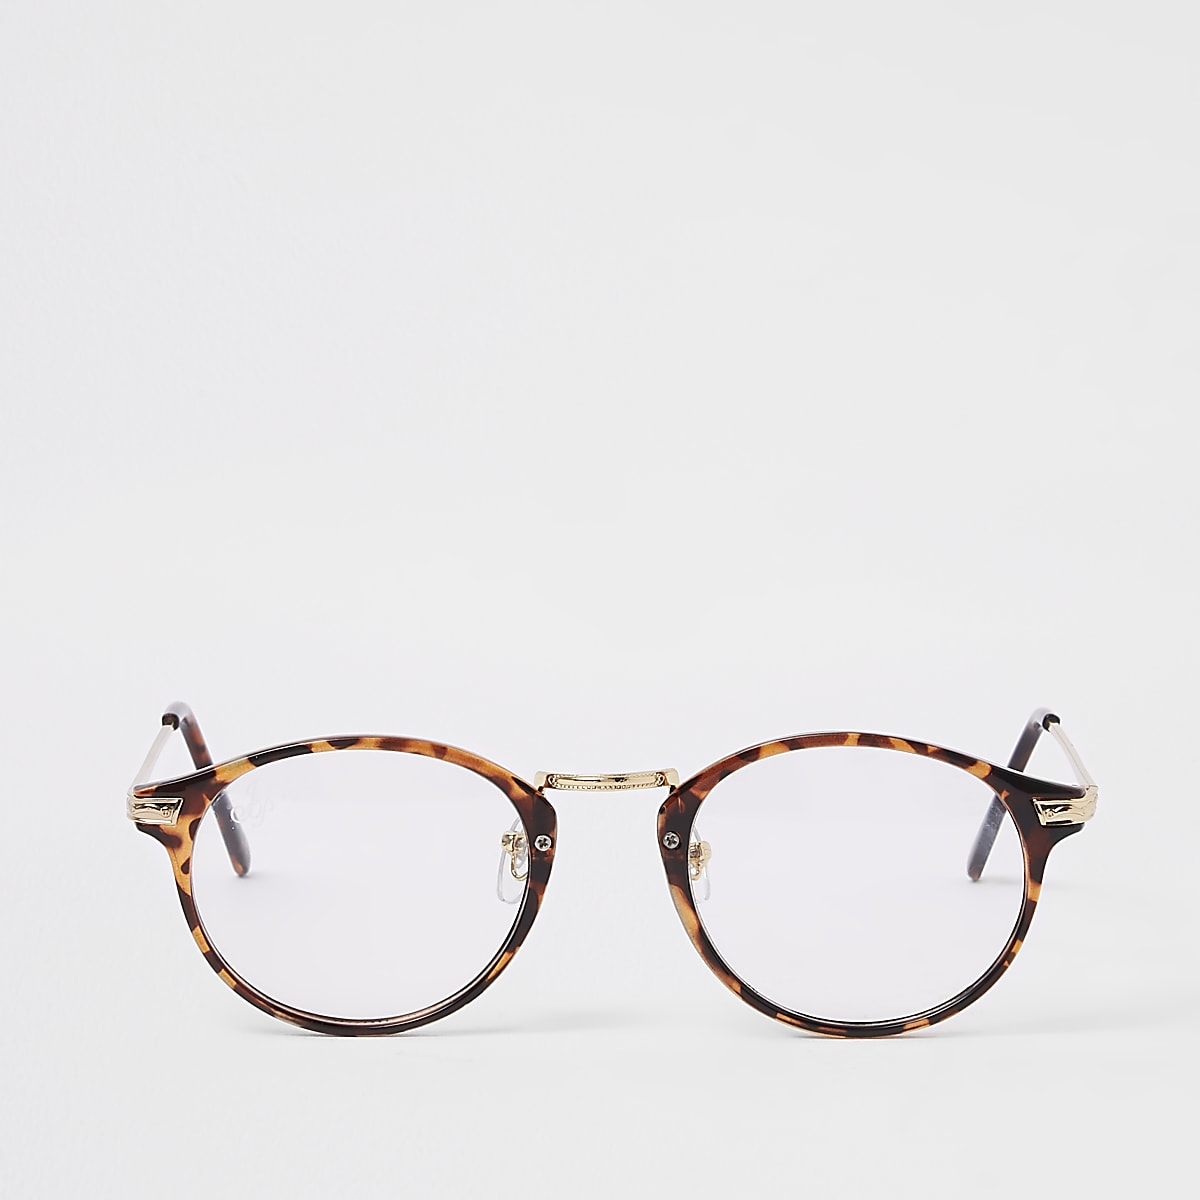 b5735b90a74155 Jeepers Peepers - Bruine tortoise bril met heldere glazen - Ronde ...